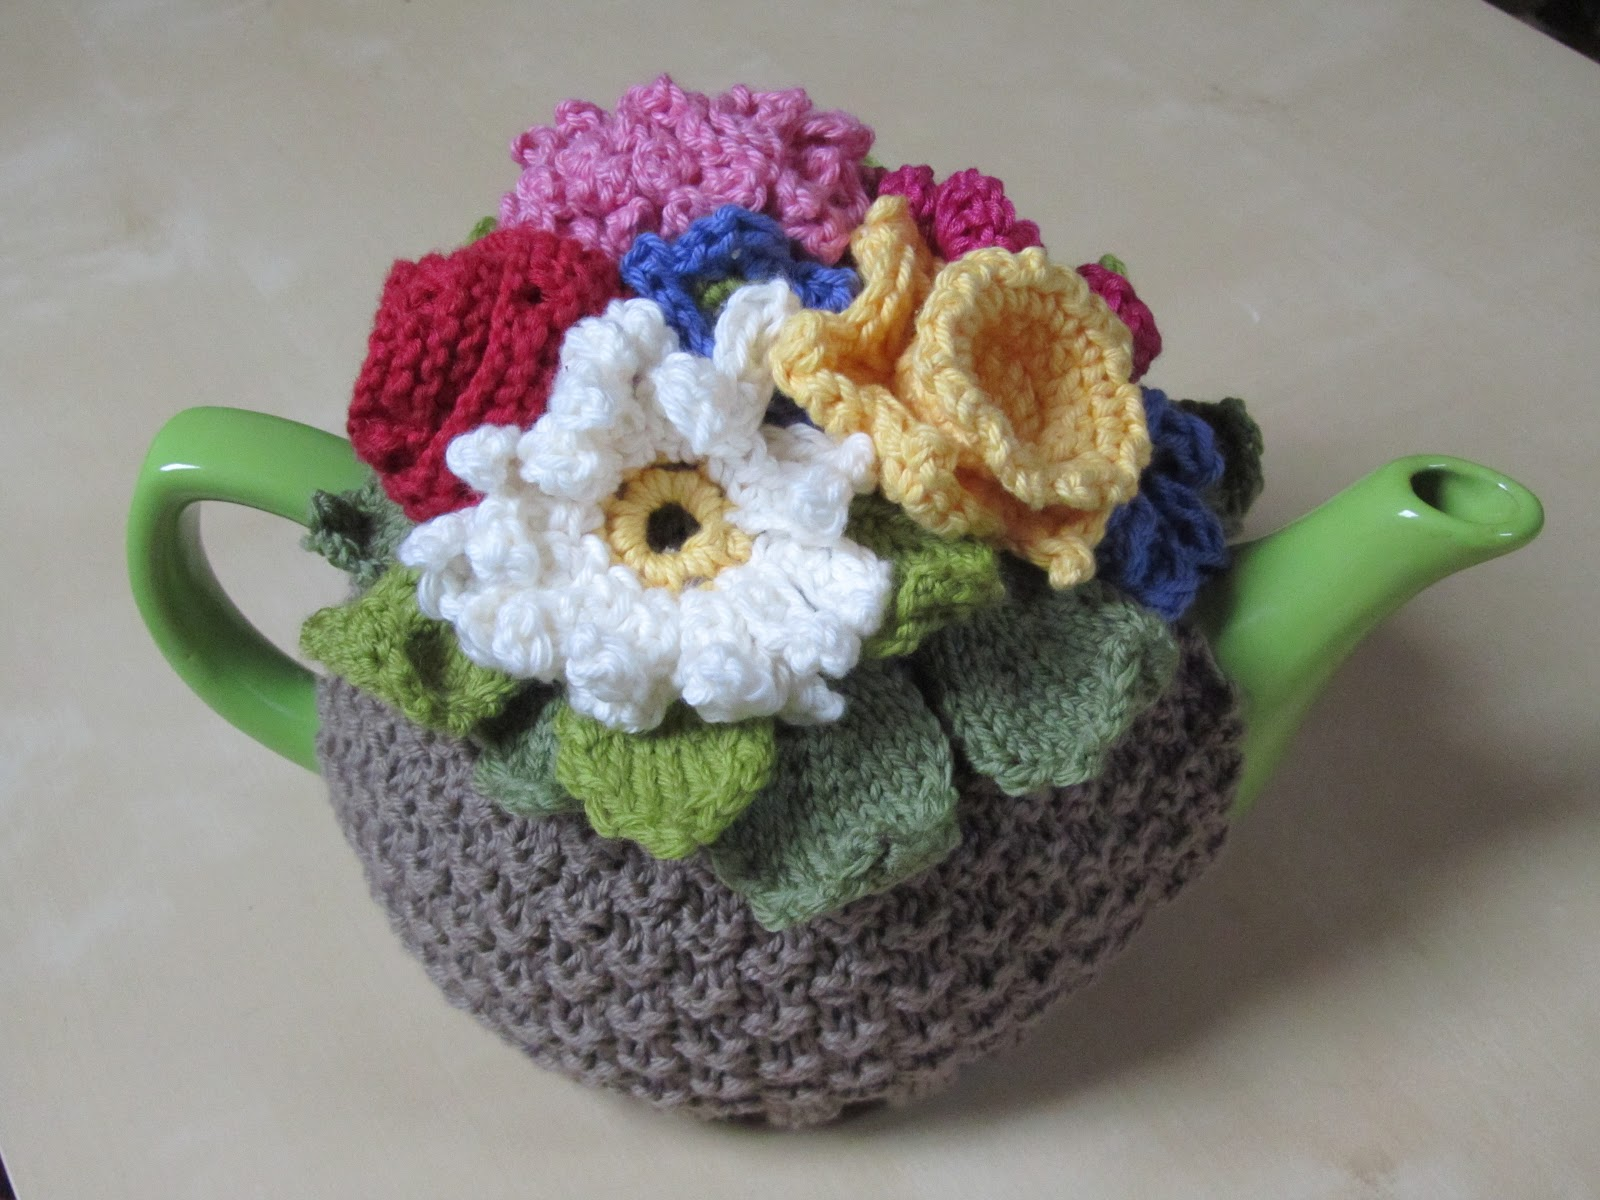 Free Crochet Daffodil Flower Pattern : fairislerona: How to crochet a daffodil